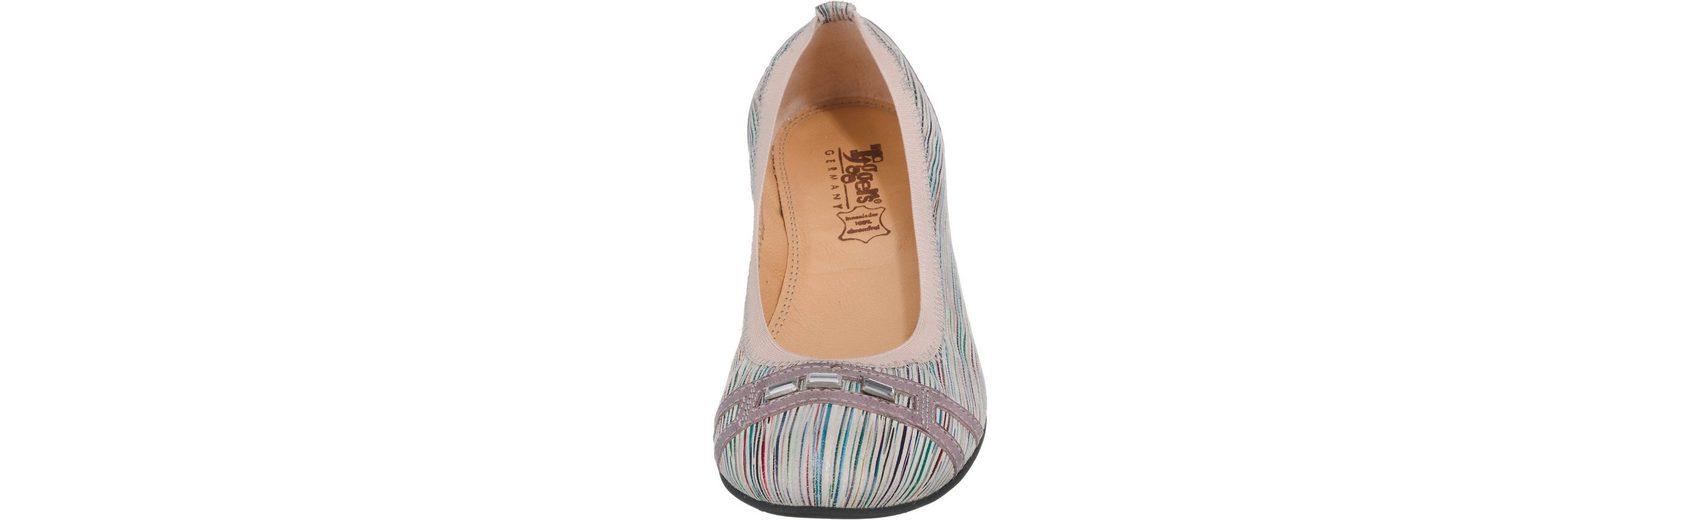 Tiggers® Sunny Ballerinas 100% Authentisch 7Nkmy5k